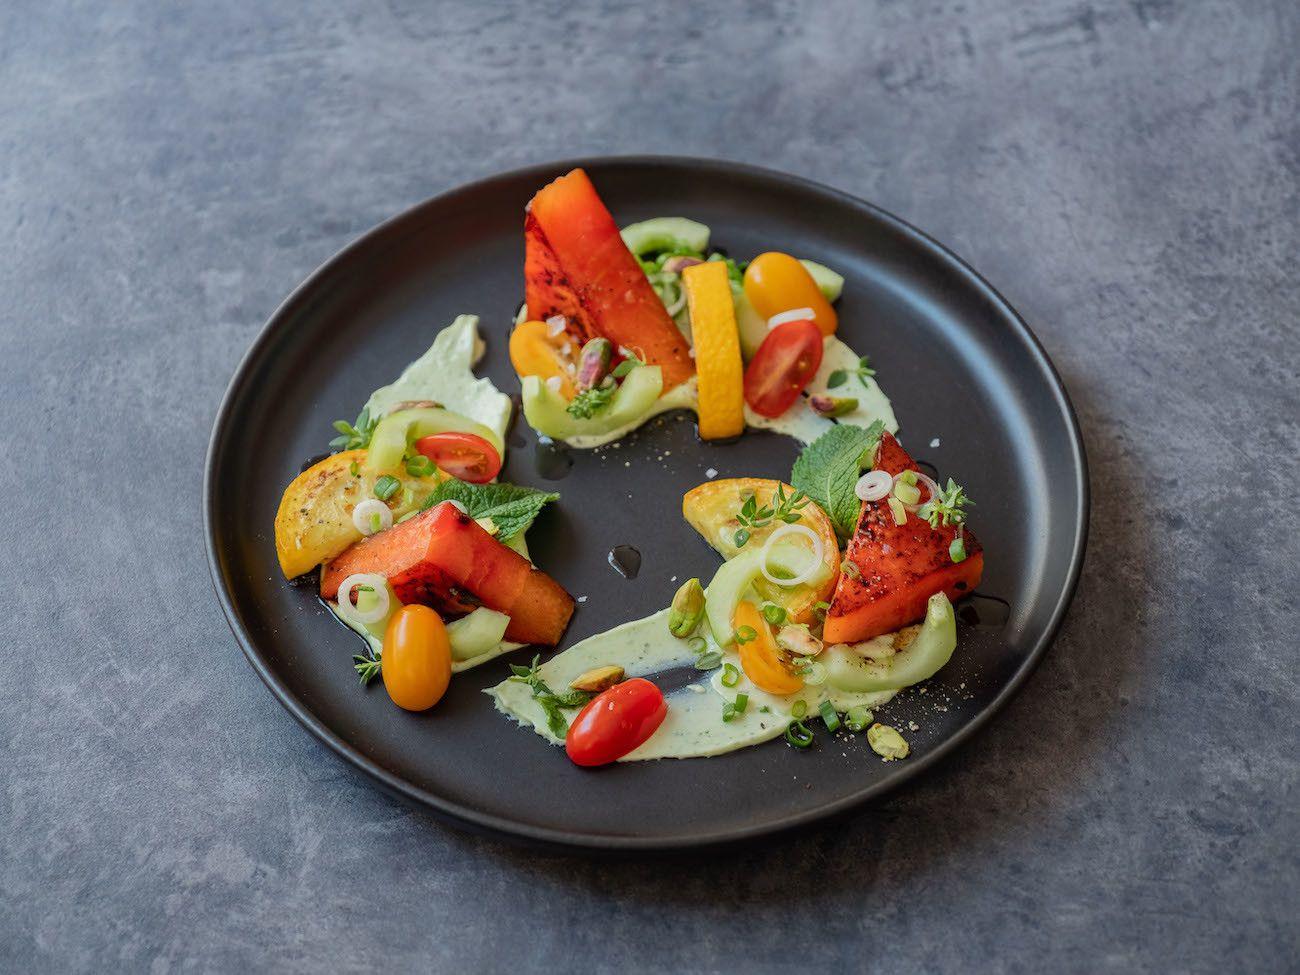 Foodblog, About Fuel, Rezept, Wassermelonensalat auf Basilikum-Feta-Creme, Tomaten, Gurken, Minze, Thymian